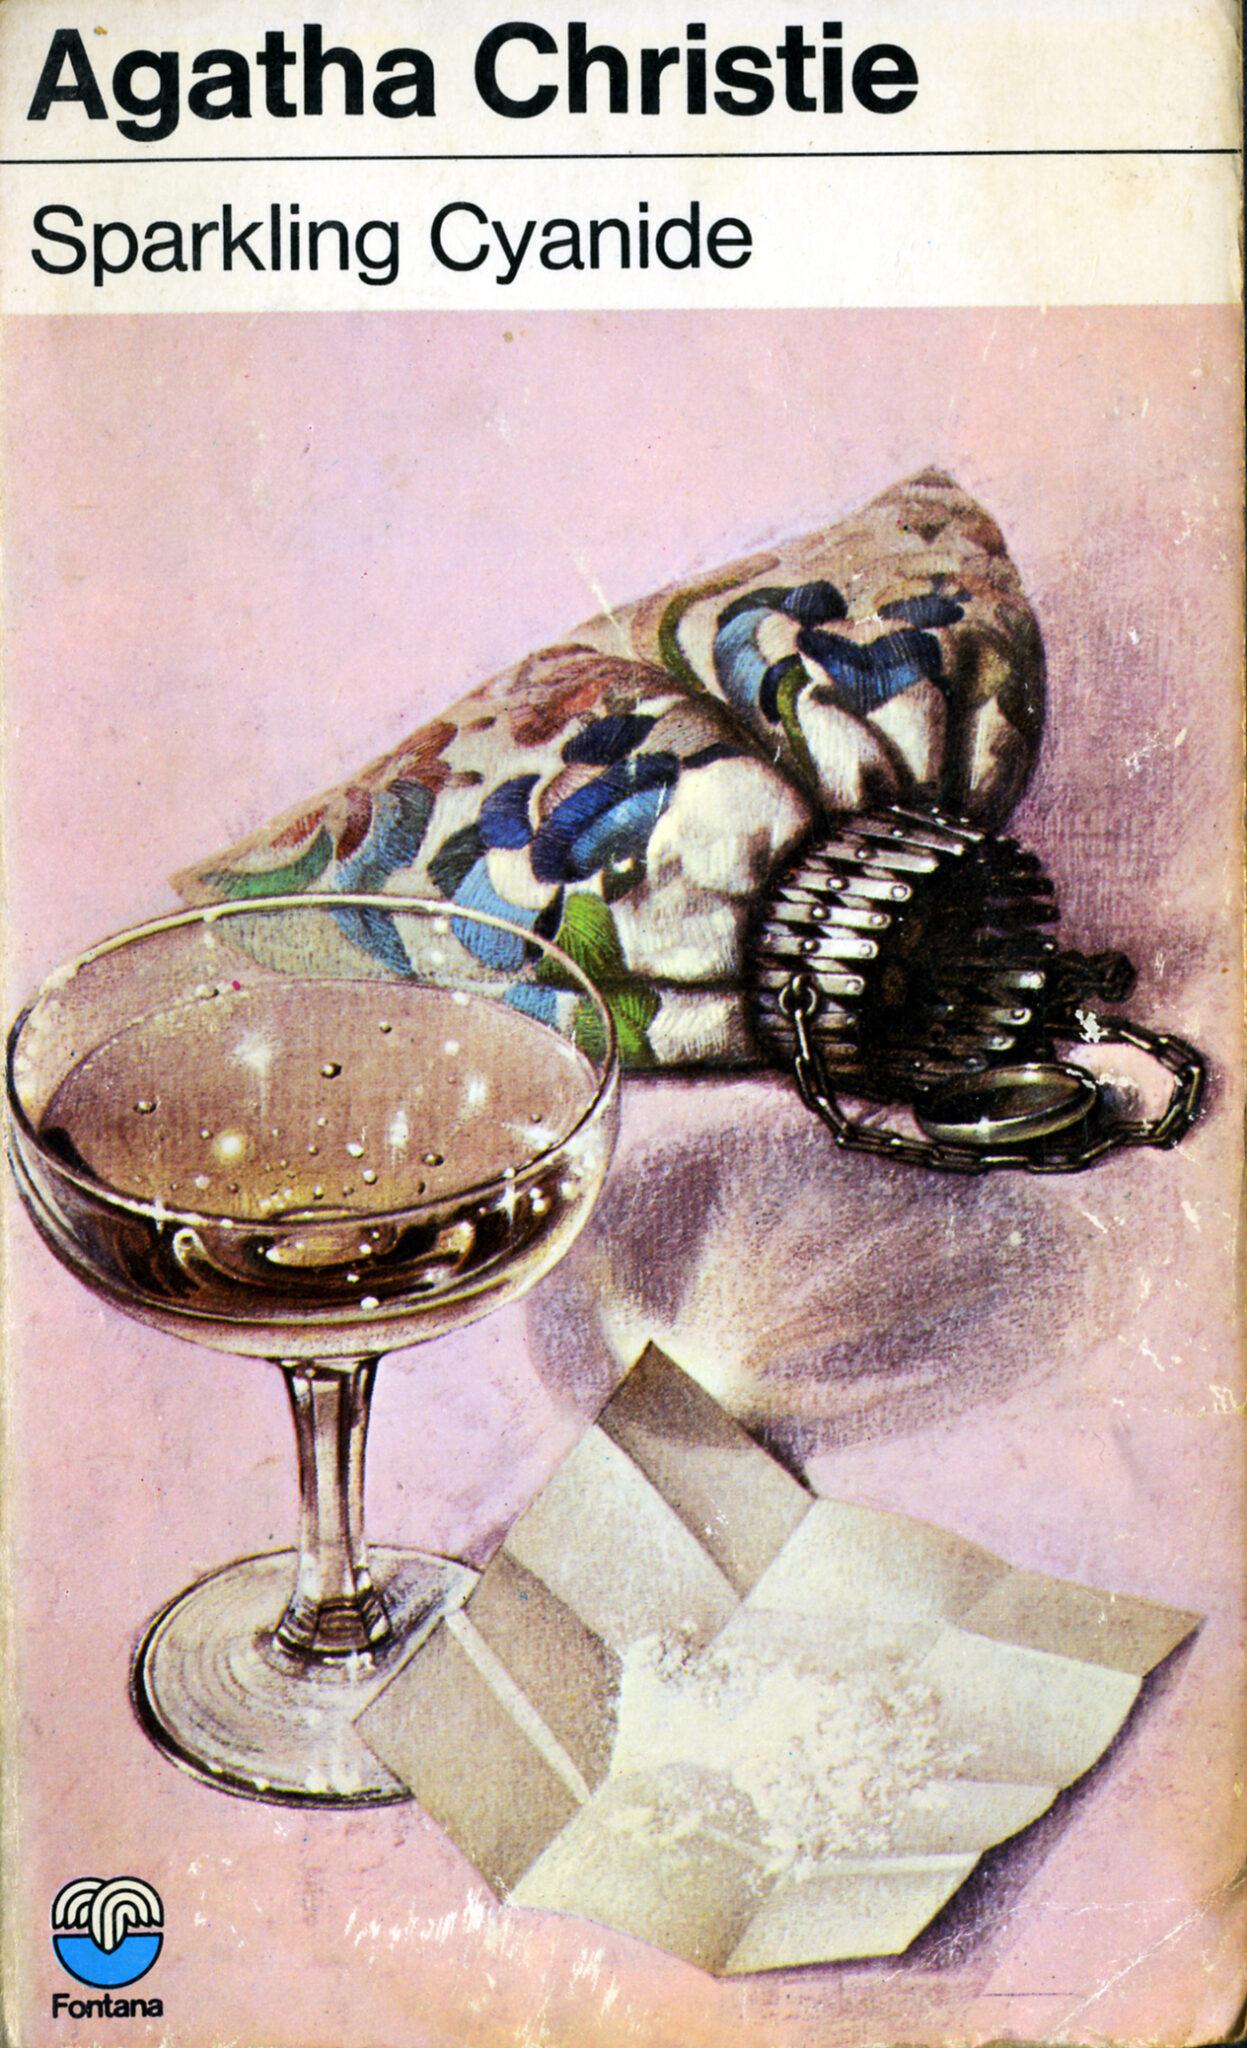 Agatha Christie Tom Adams Sparkling Cyanide Fontana